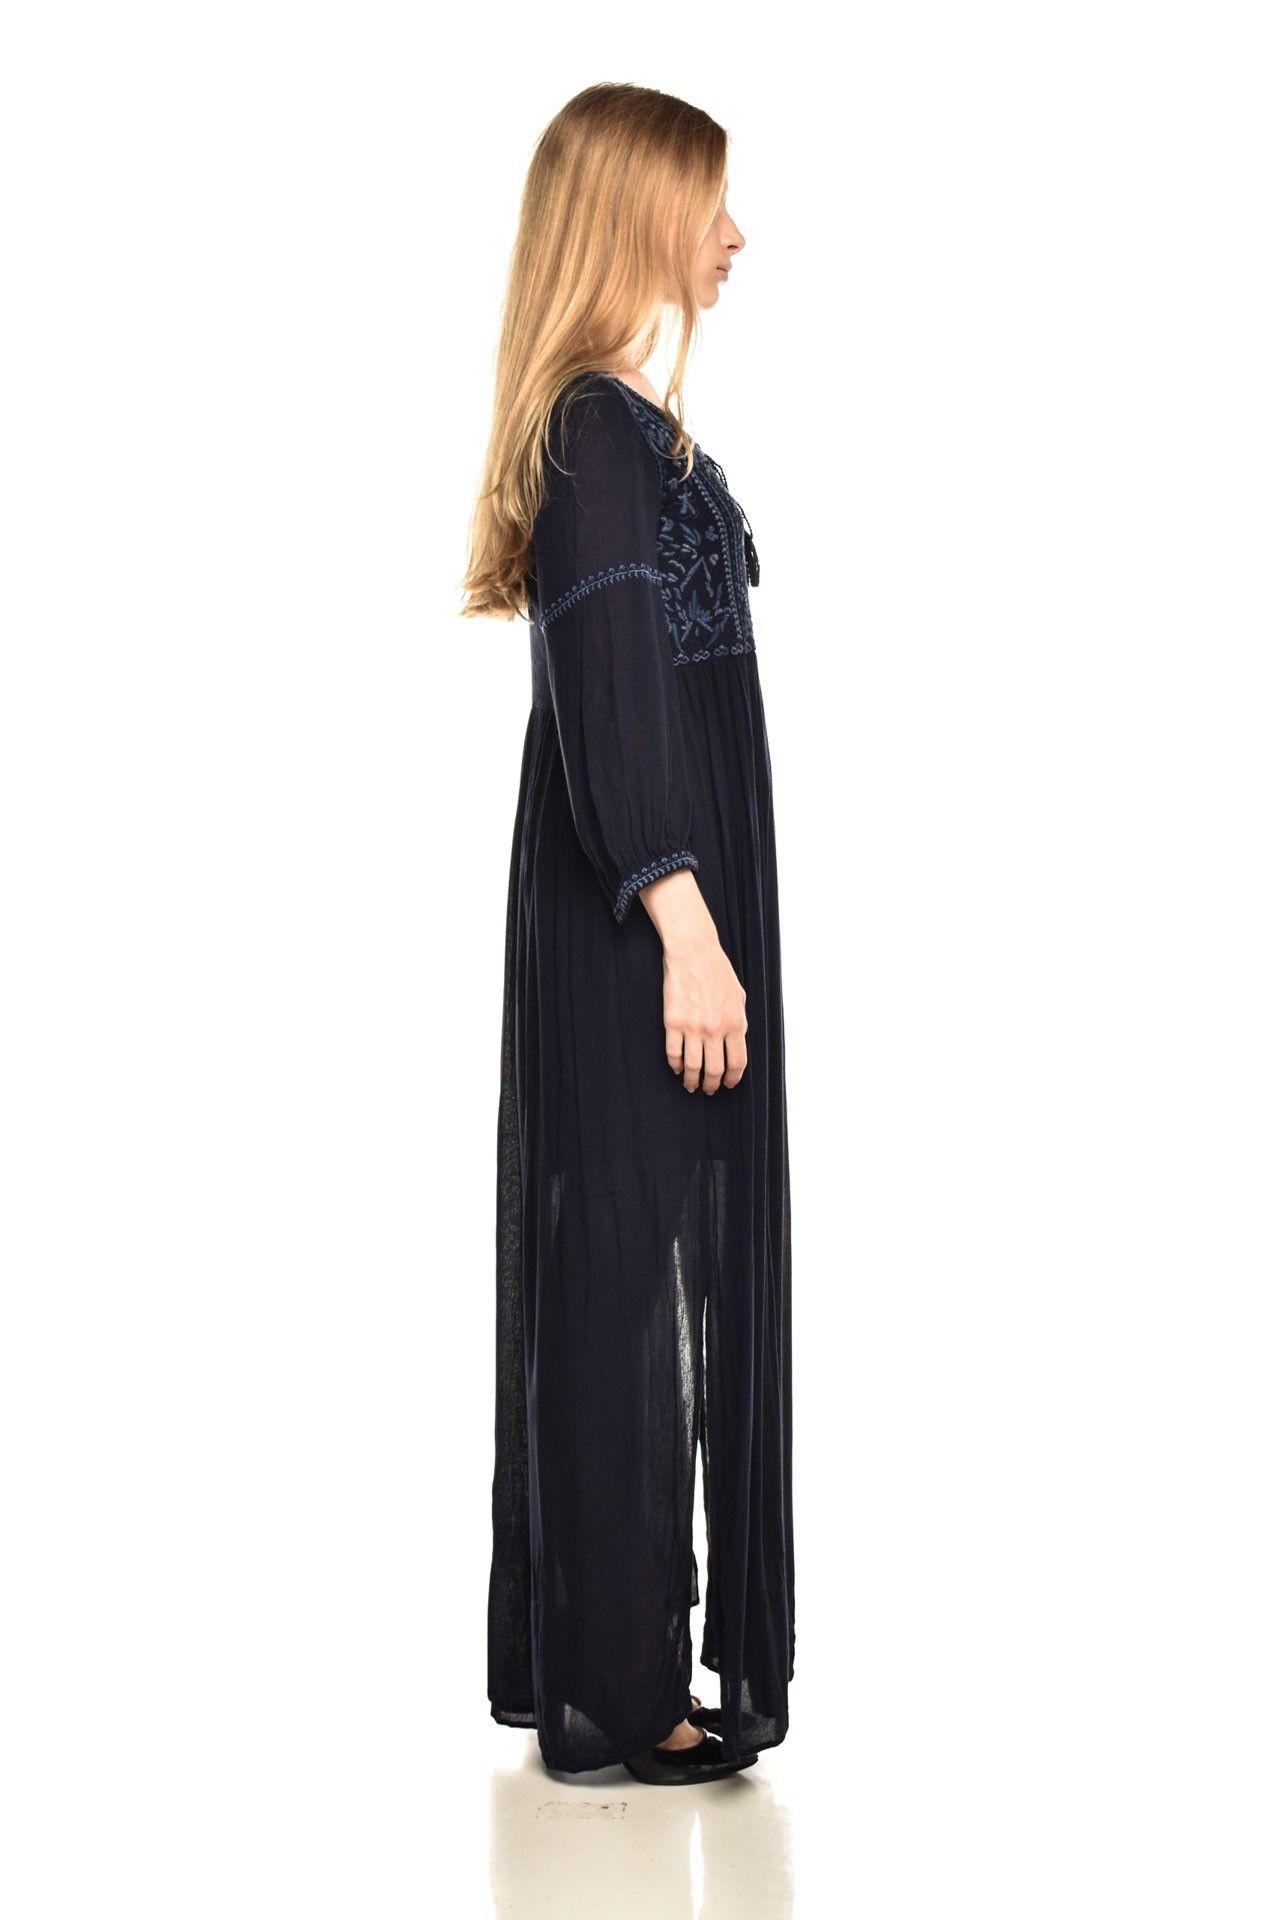 Zara - Vestido Navy Longo - Foto 3